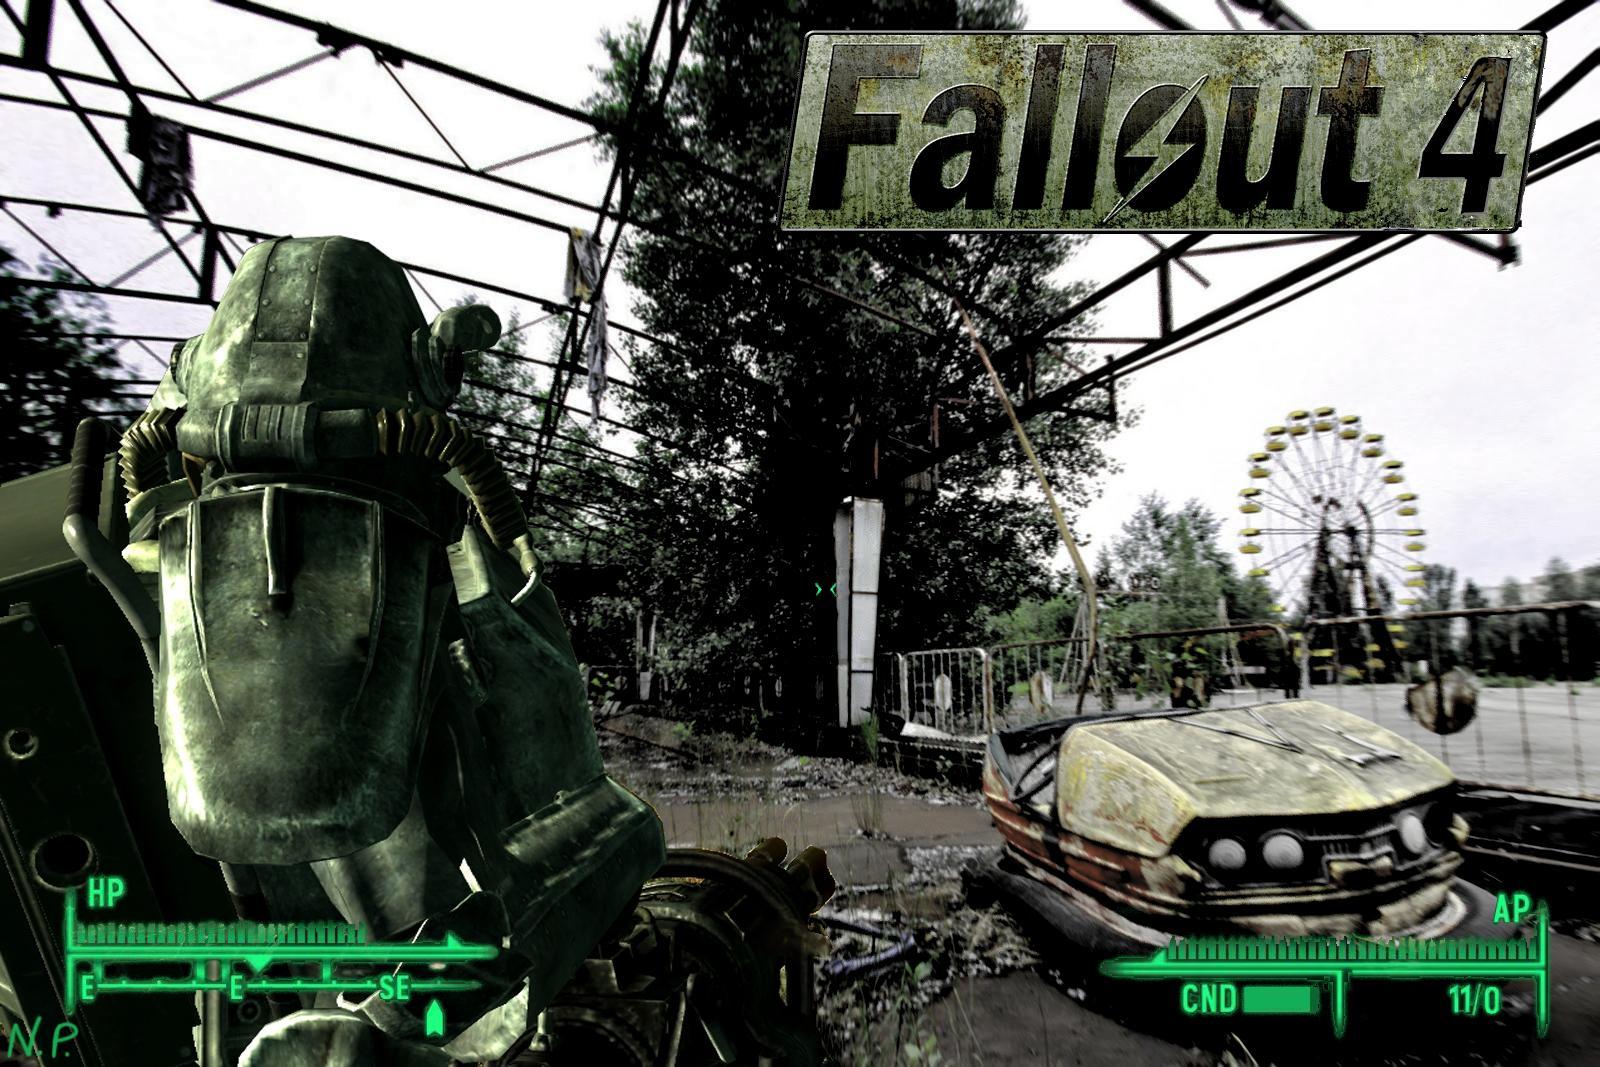 [48+] Fallout 4 Wallpaper 1080p on WallpaperSafari